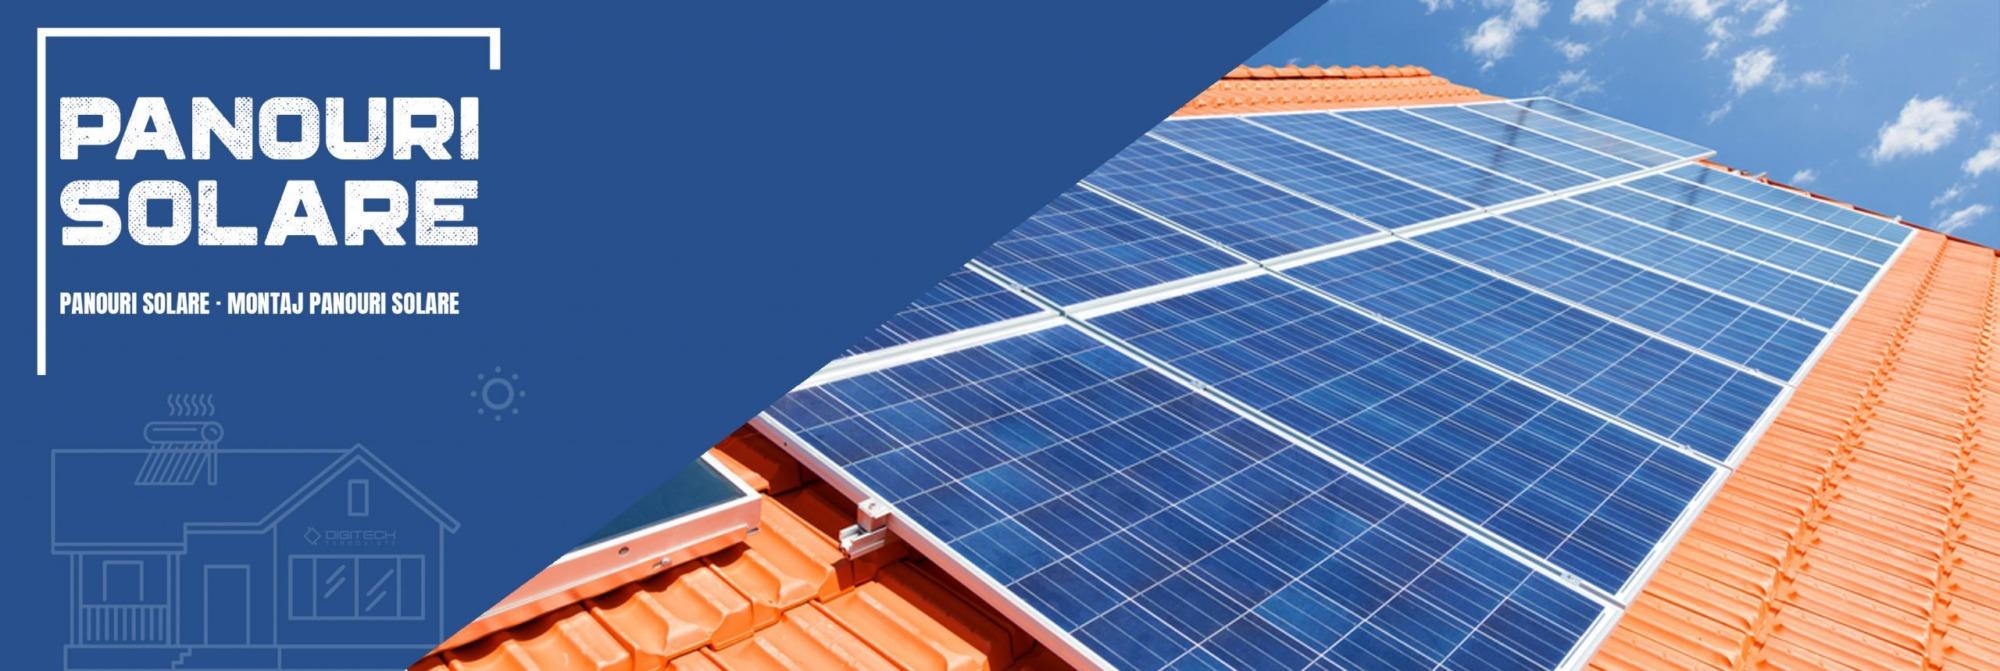 Panouri solare inox